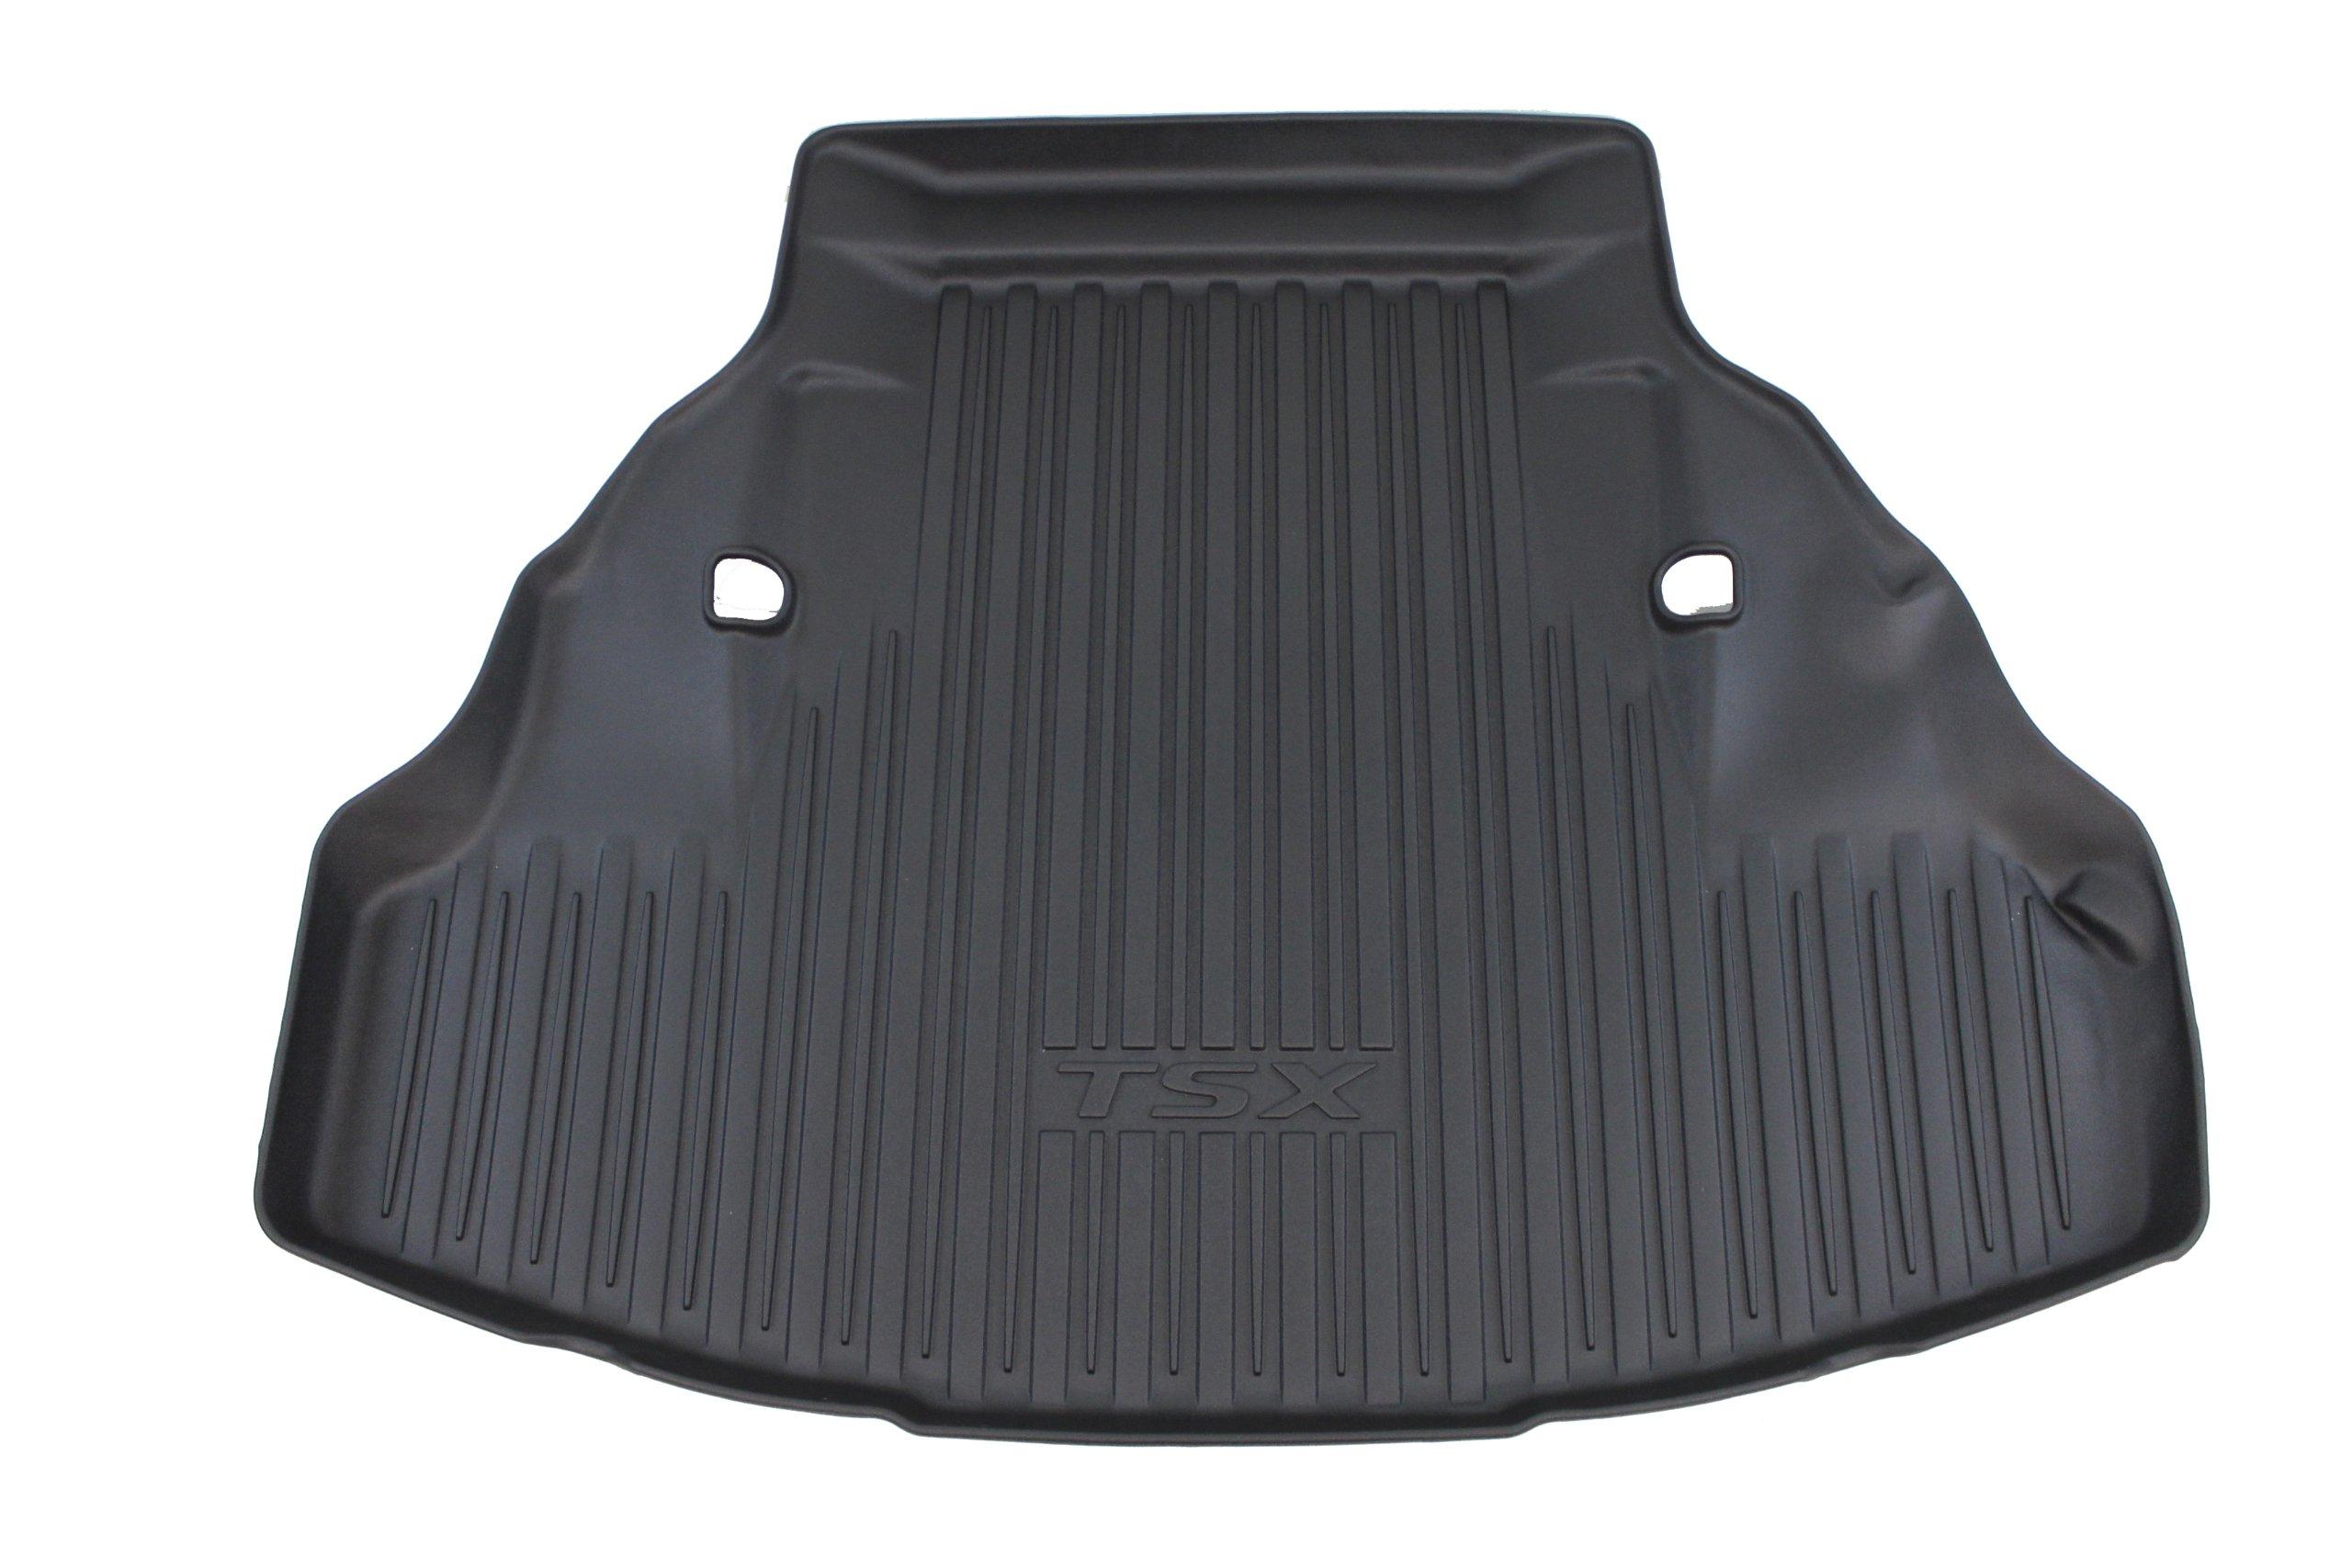 Acura Genuine Accessories 08U45-TL2-200 Trunk Tray